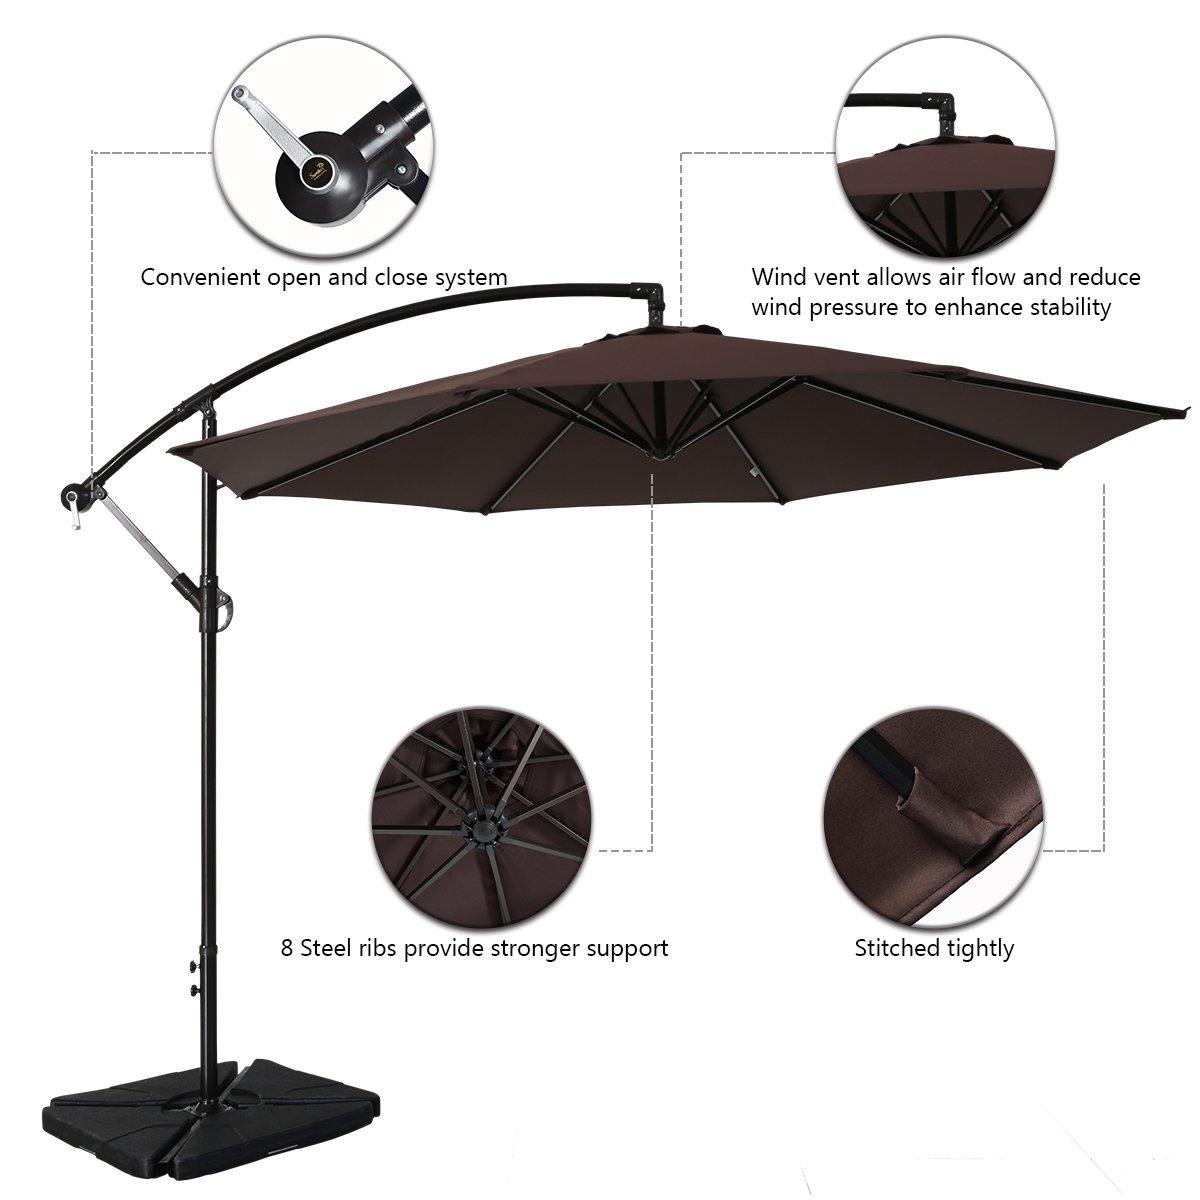 Sumbel Outdoor Living Offset Hanging Umbrella 10 Ft Cantilever Patio Umbrella Outdoor Market Umbrellas with Cross Base, (Coffee)